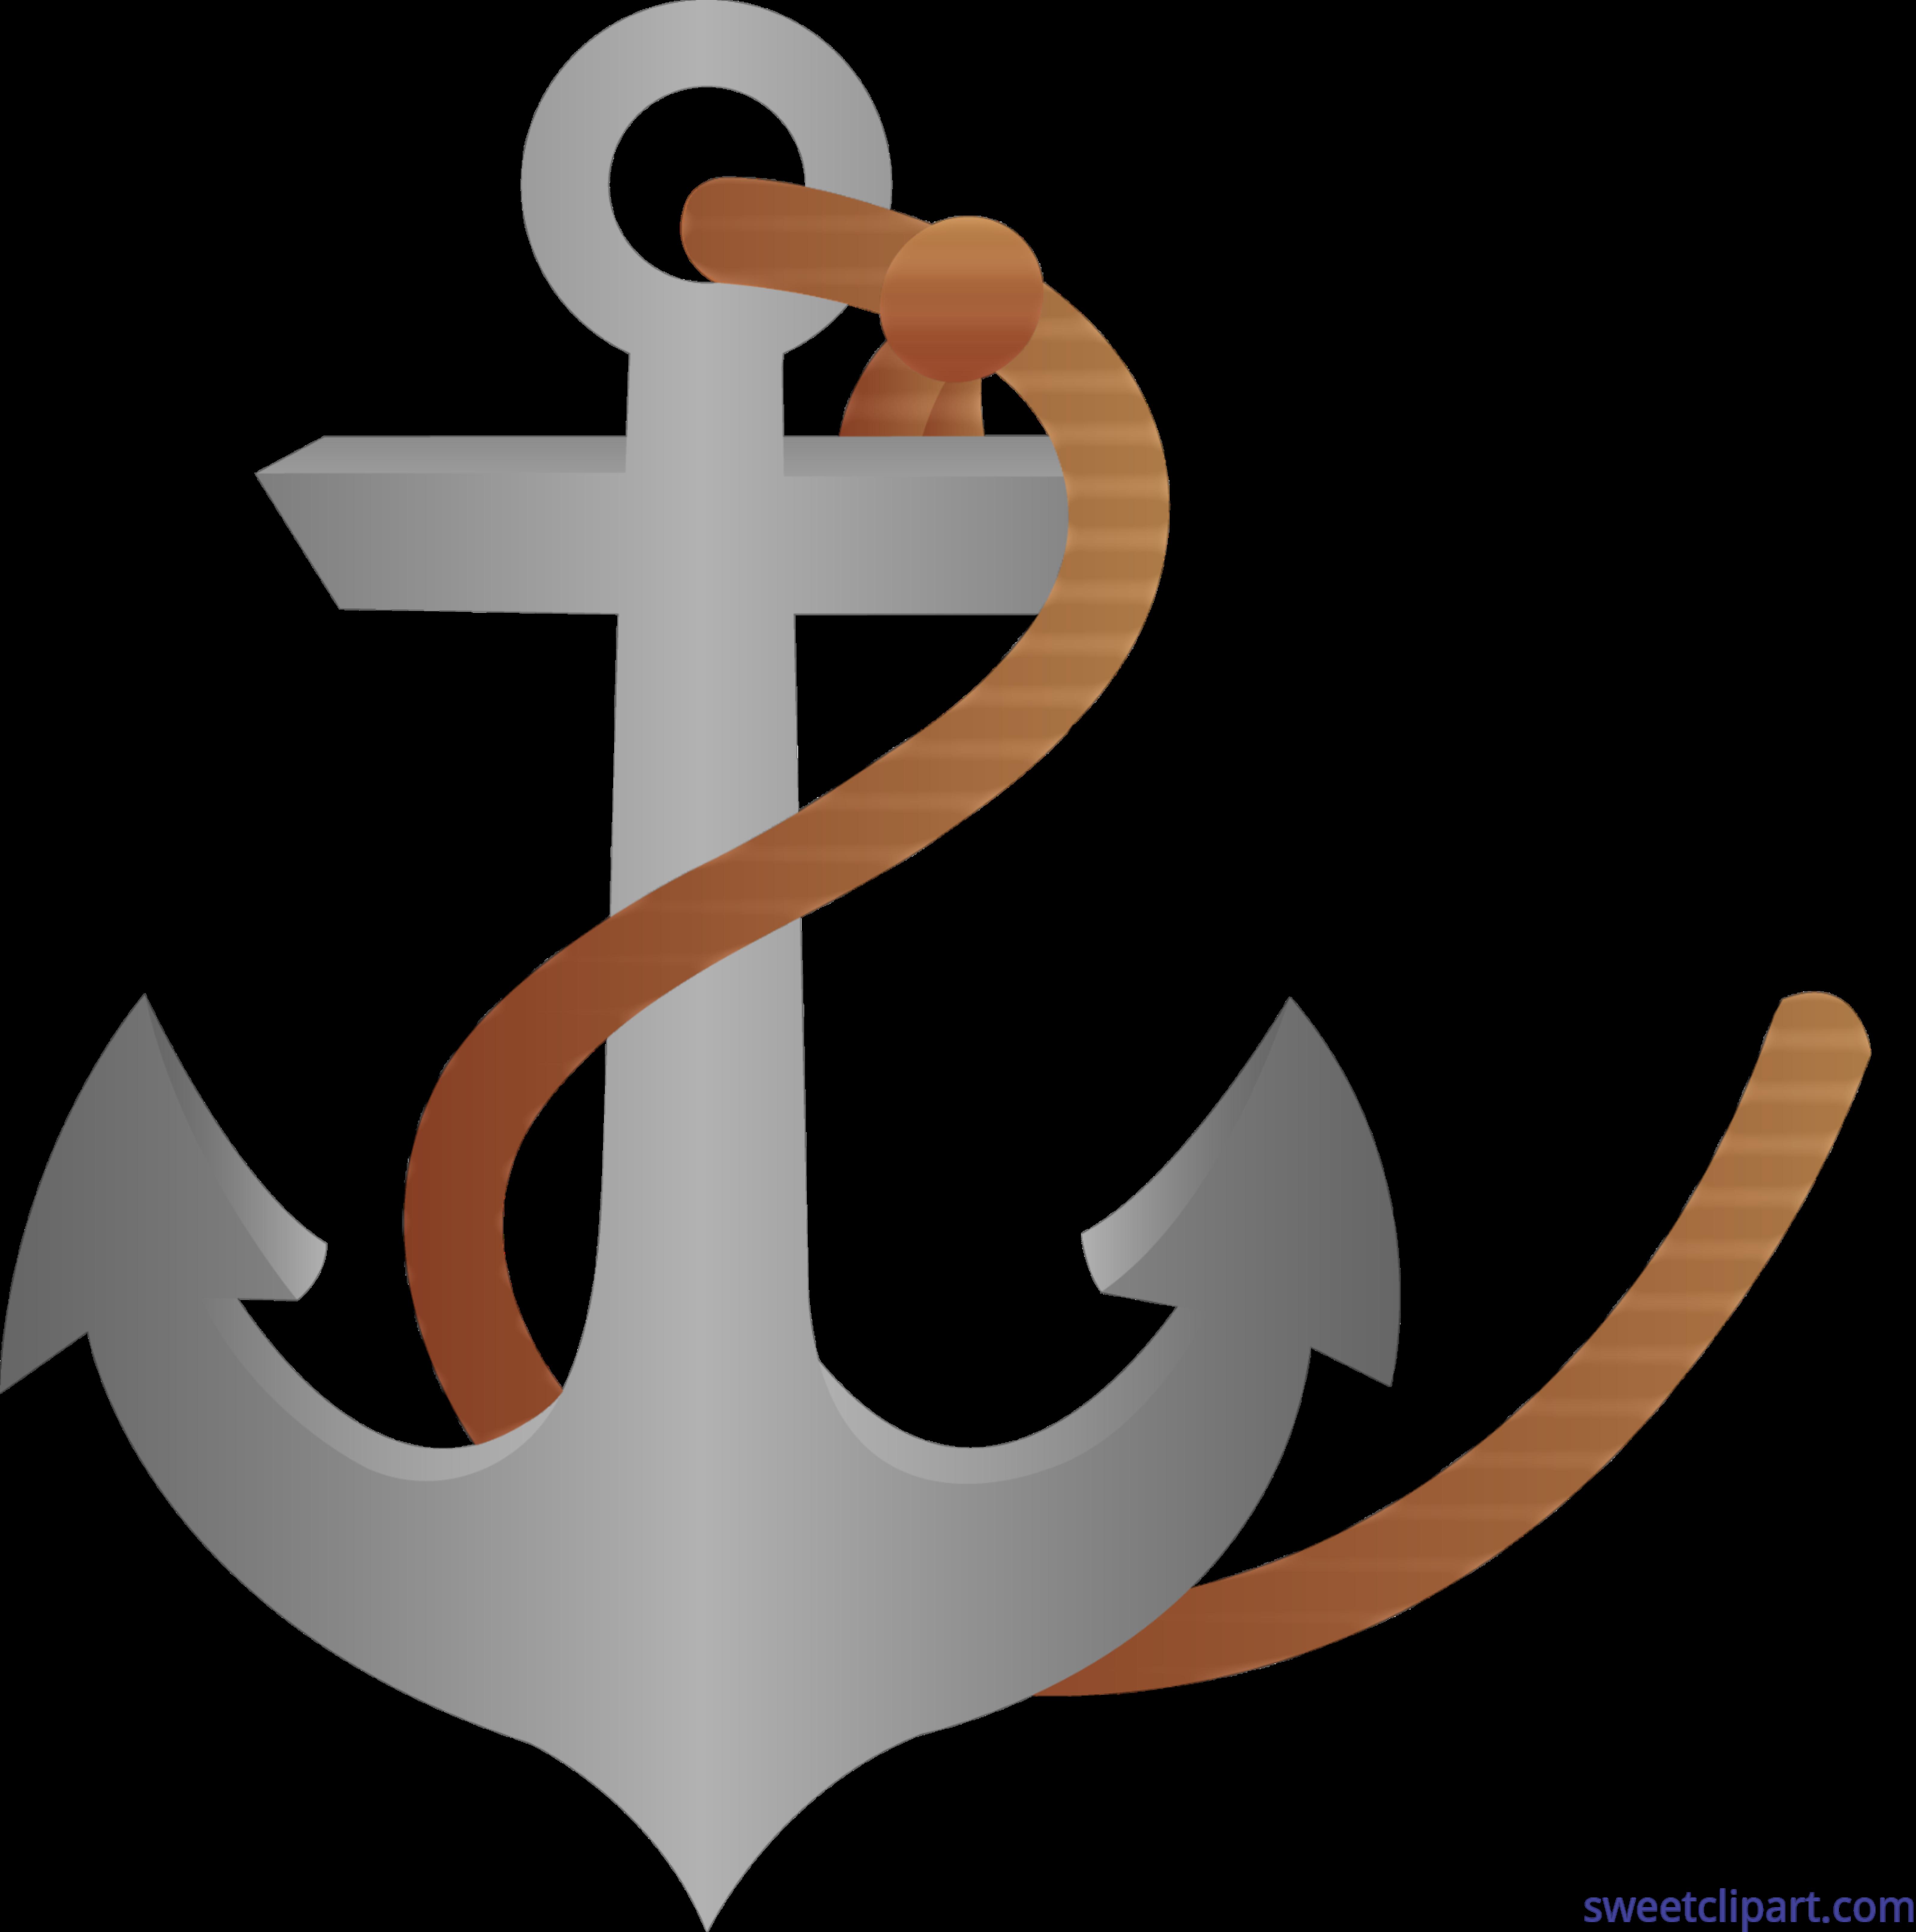 anchor with rope clip art sweet clip art rh m sweetclipart com Anchor with Chain Clip Art Nautical Anchor Clip Art